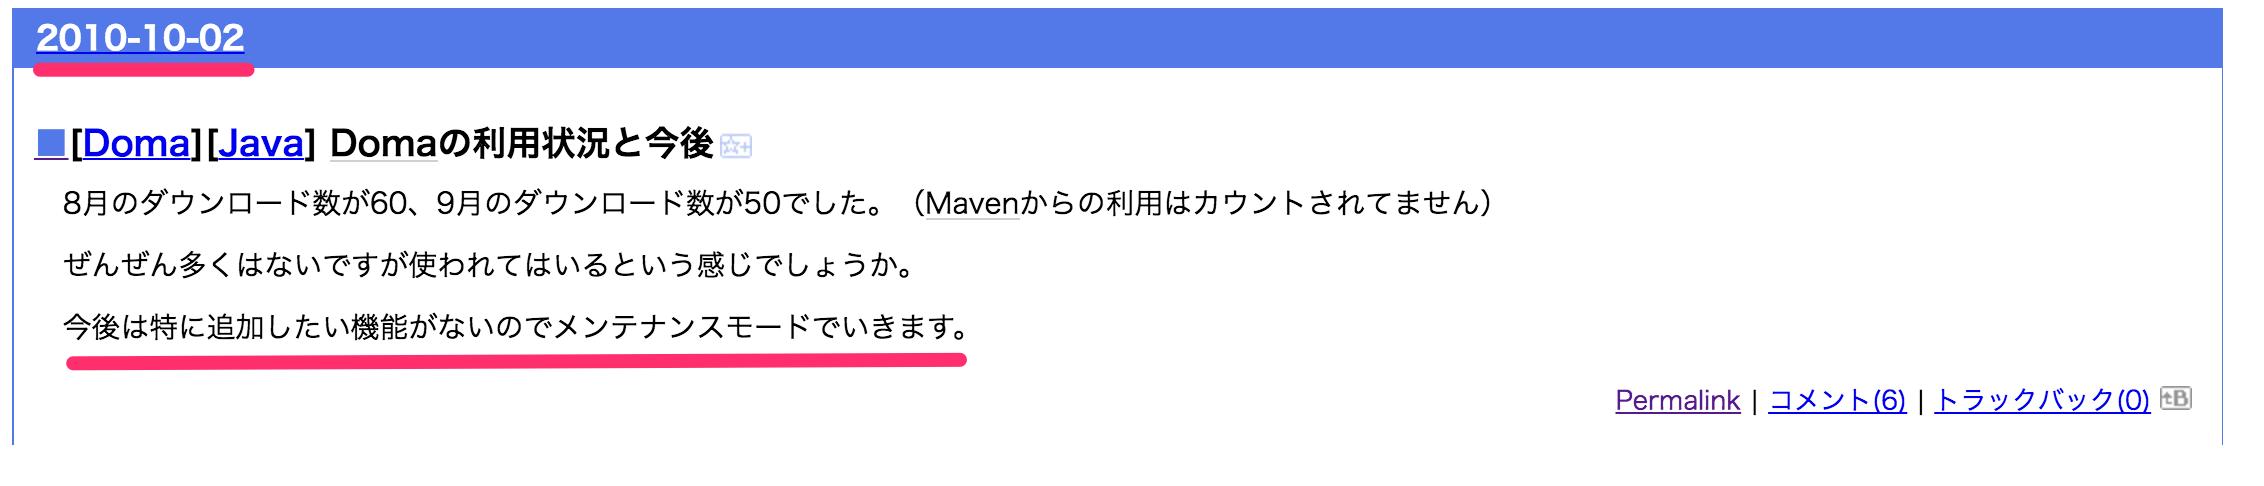 http://d.hatena.ne.jp/taedium/20101002/p2